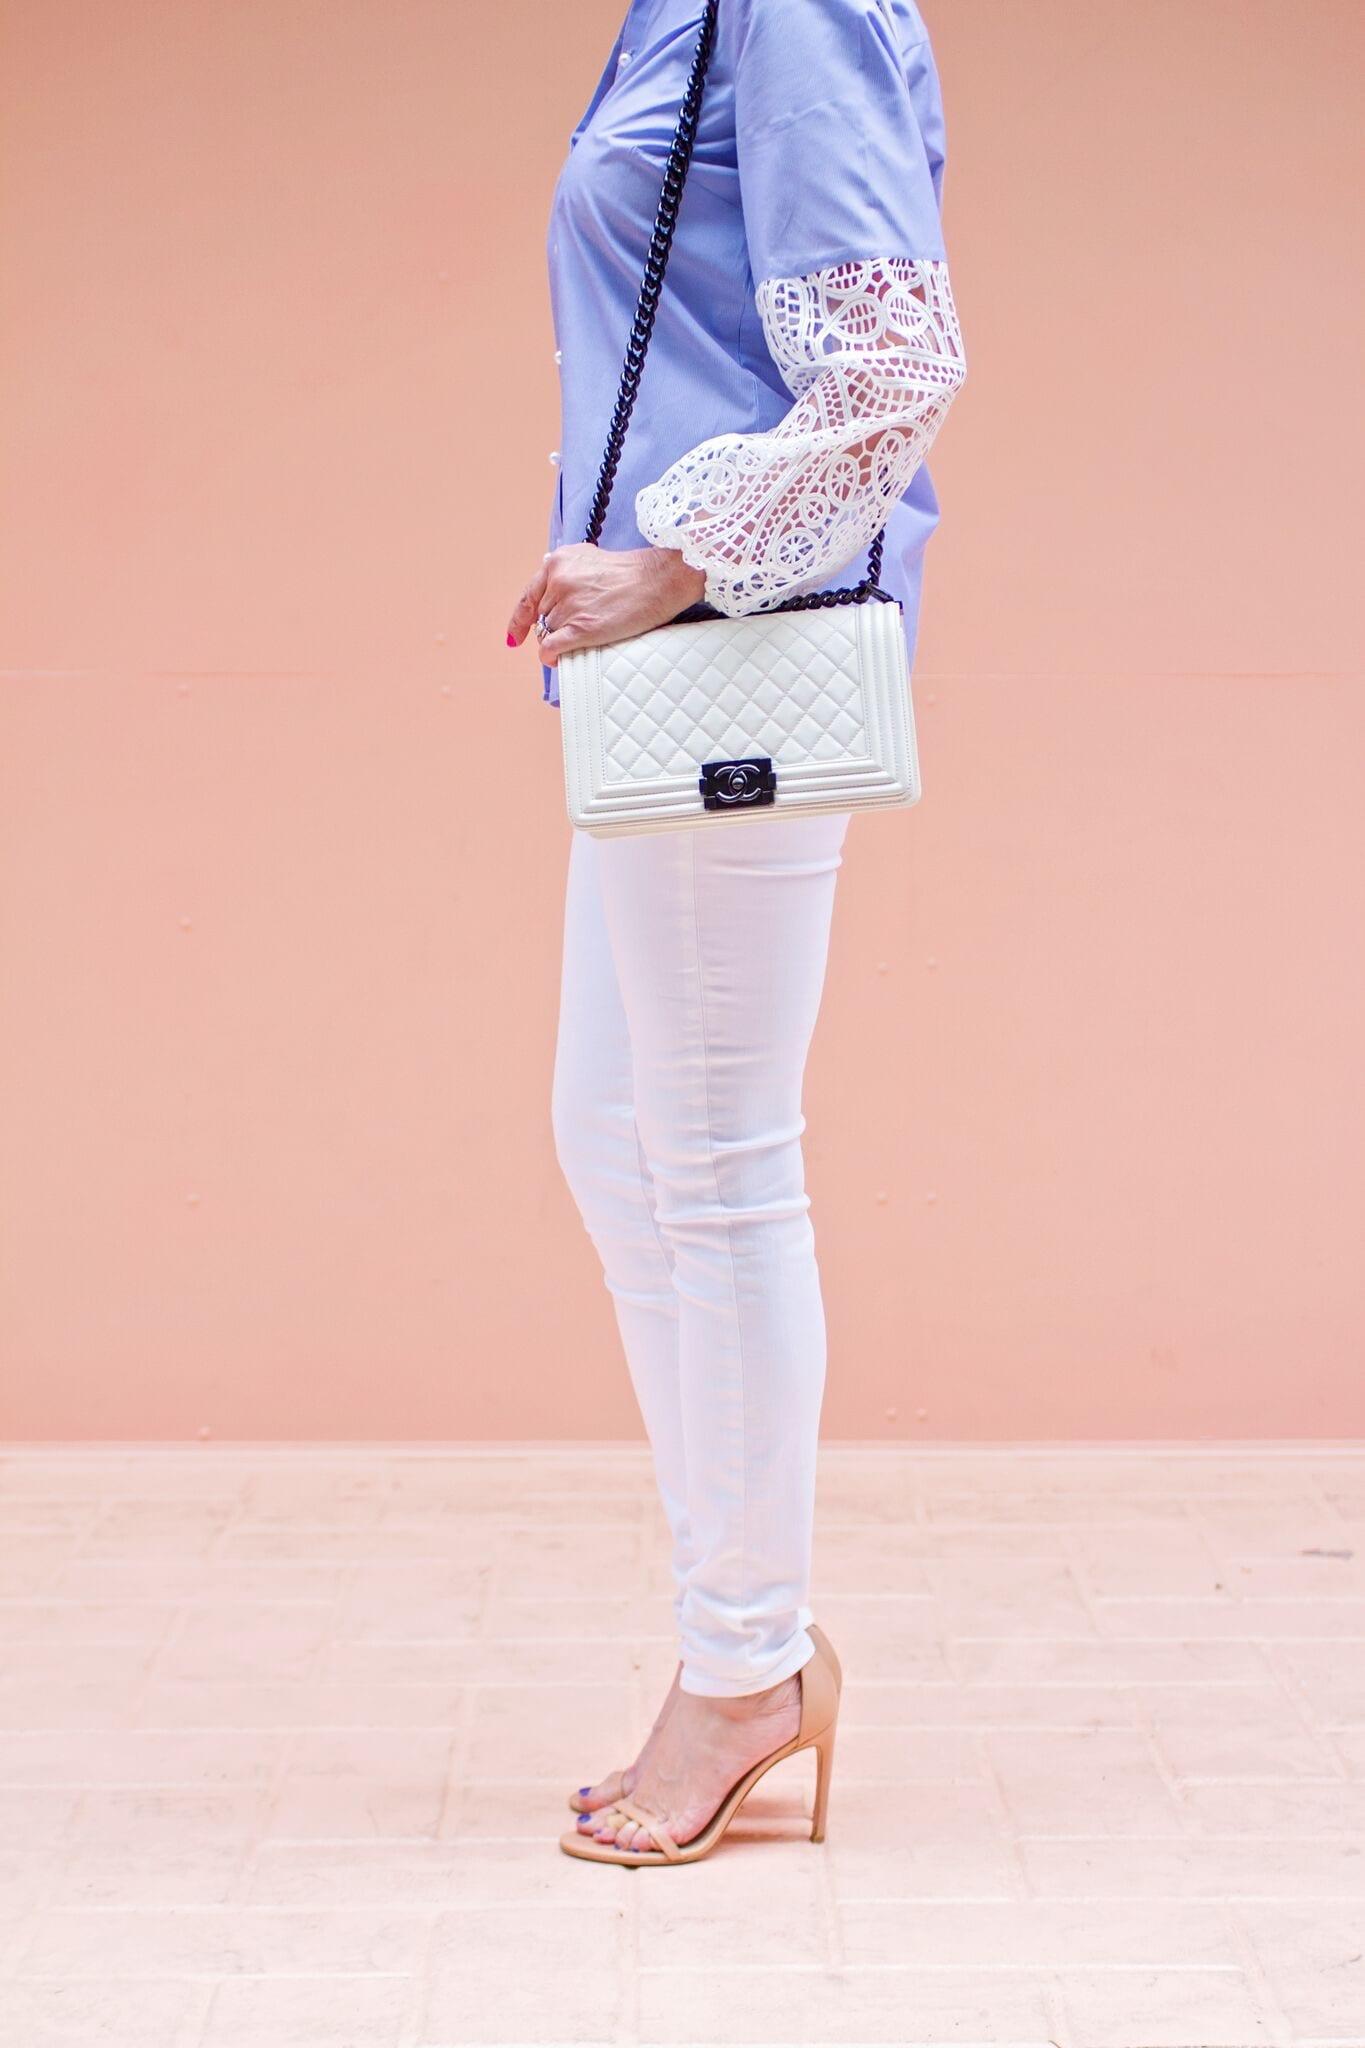 classic shirts, button front shirt, lace sleeve, blue shirts, feminine shirts, pearl button shirts, white jeans, Chanel bag, Stuart Weitzman